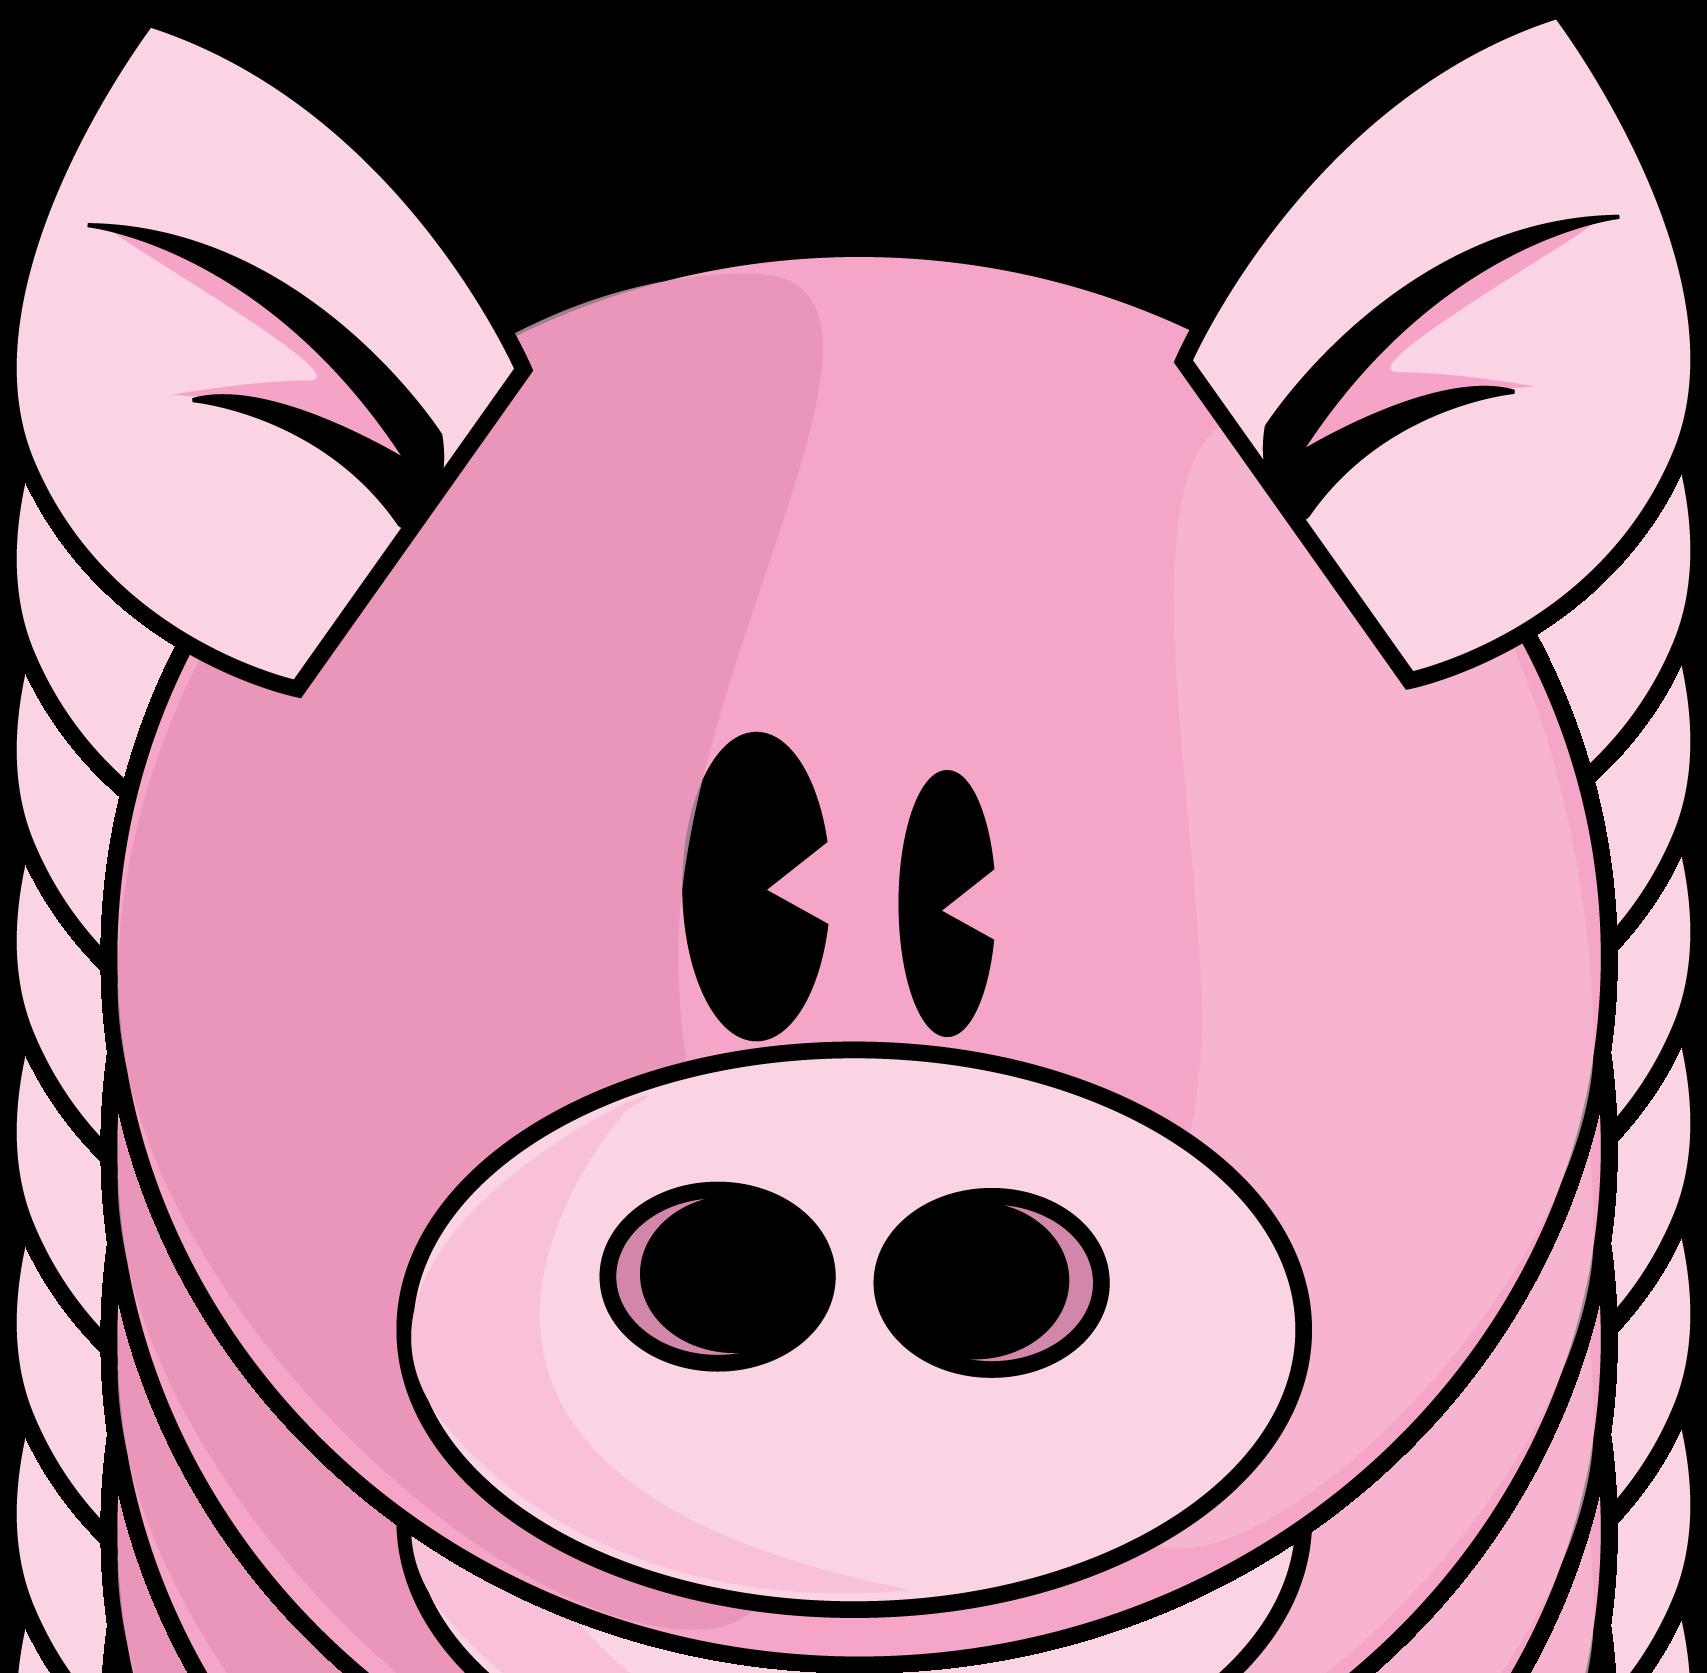 Clipart png face. Pig hd transparent images